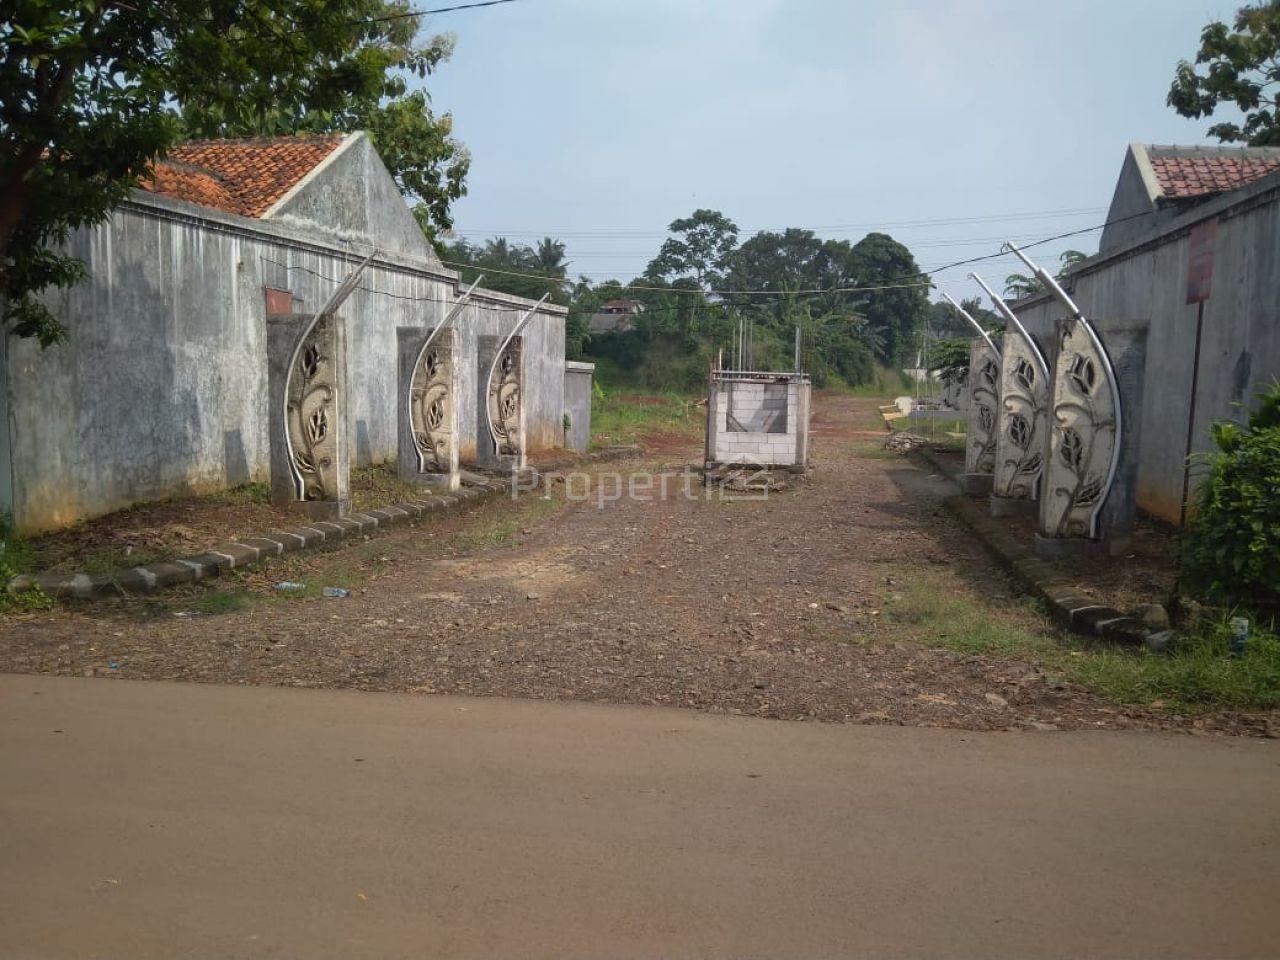 Land for Housing Designation in Kencana, Bogor City, Jawa Barat